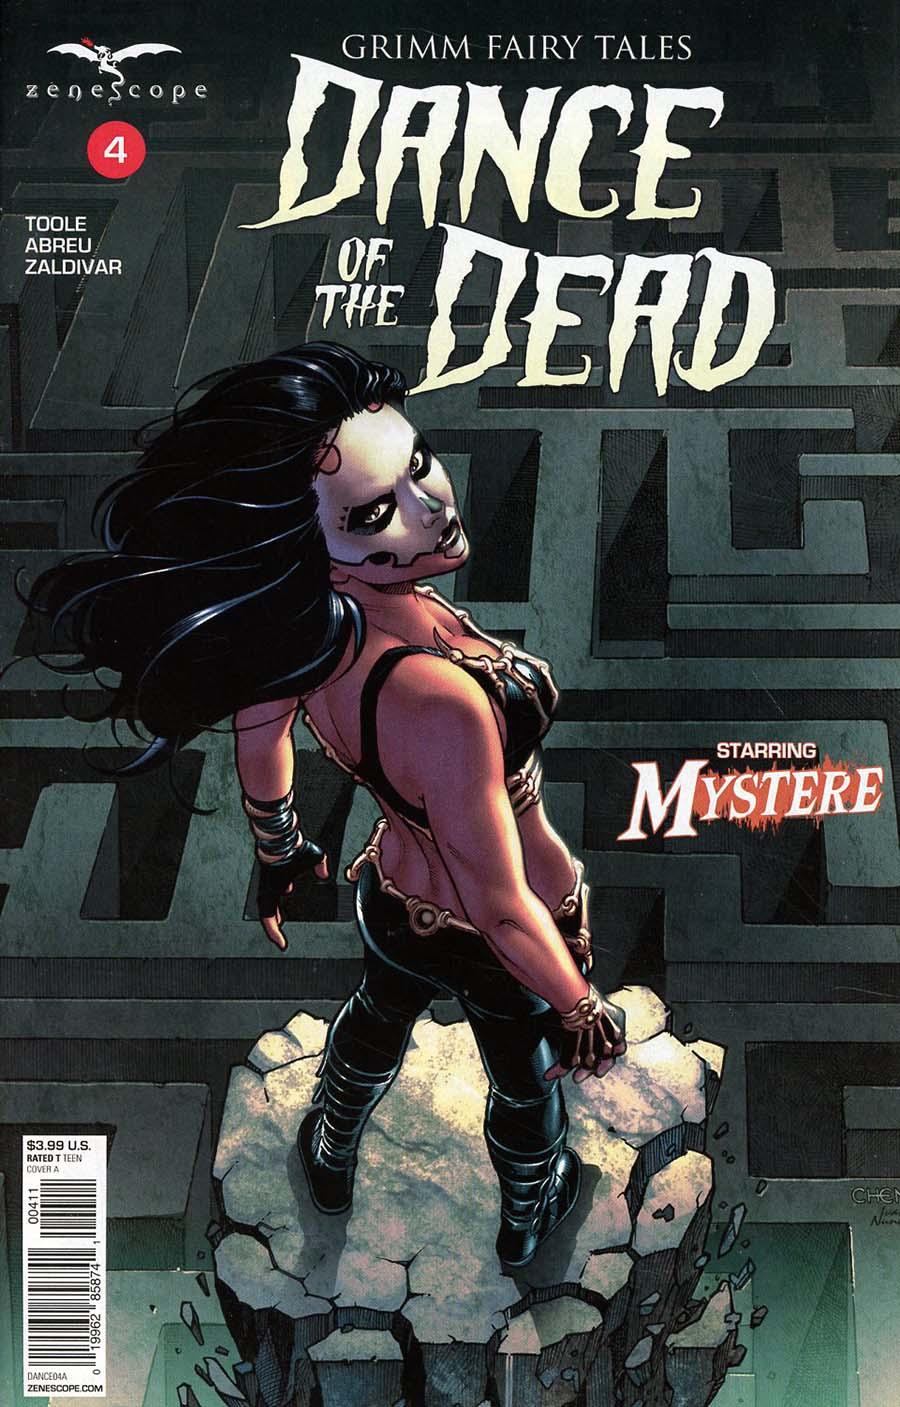 Grimm Fairy Tales Presents Dance Of The Dead #4 Cover A Sean Chen